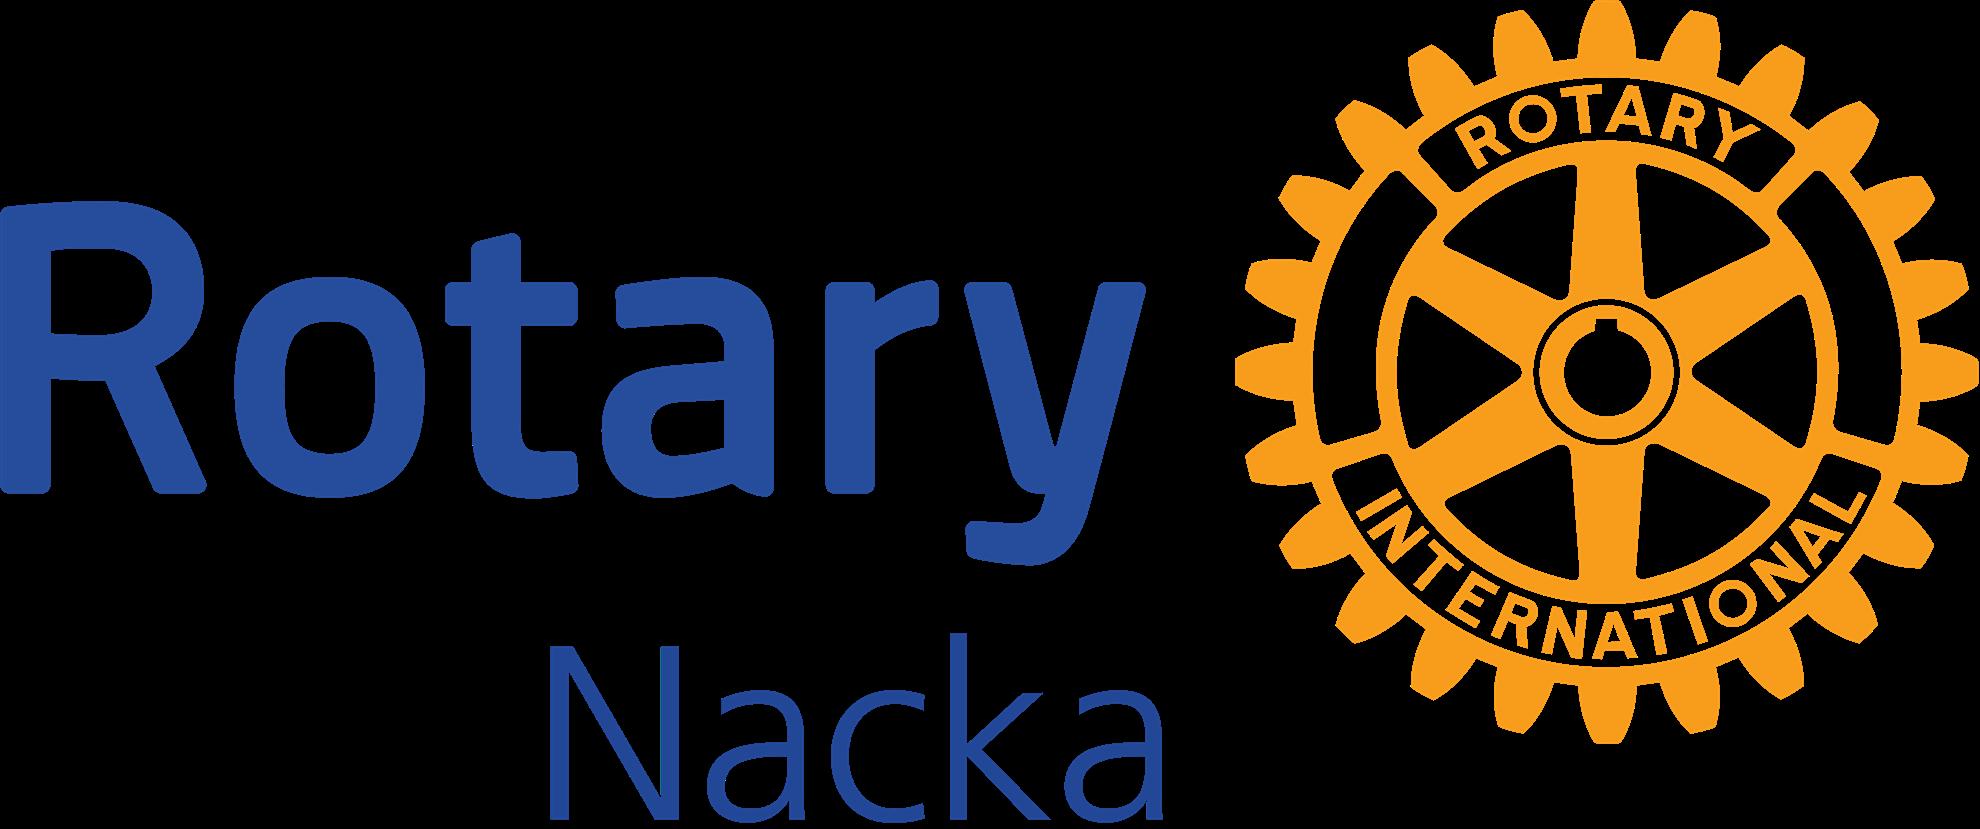 Nacka logo